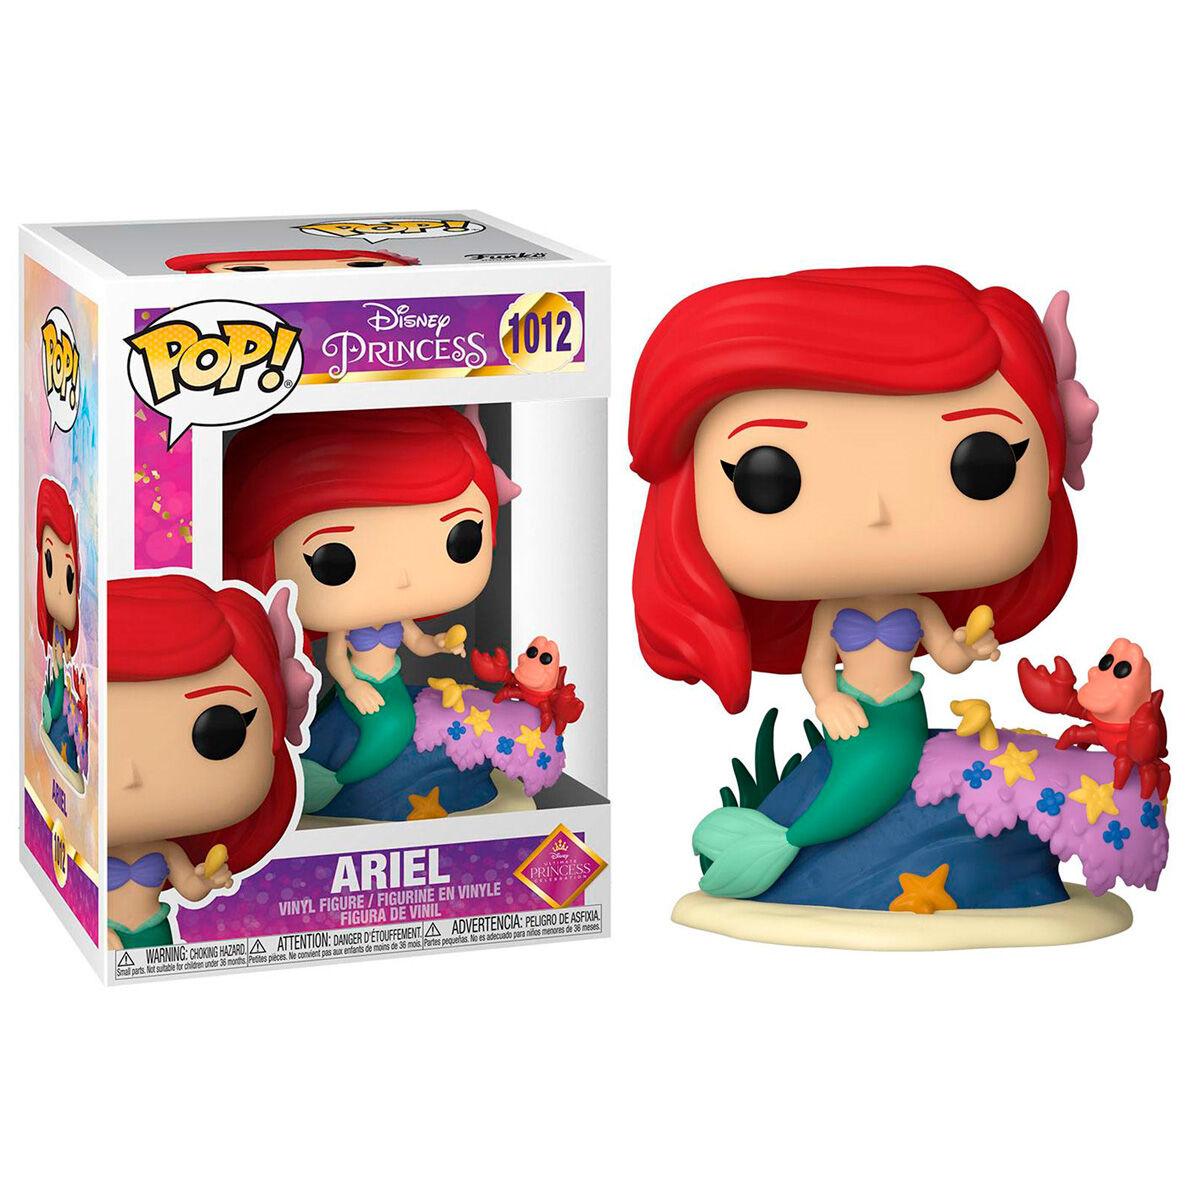 Disney Princess - Bobble Head Funko Pop N°1012 : Ultimate Princess Ariel